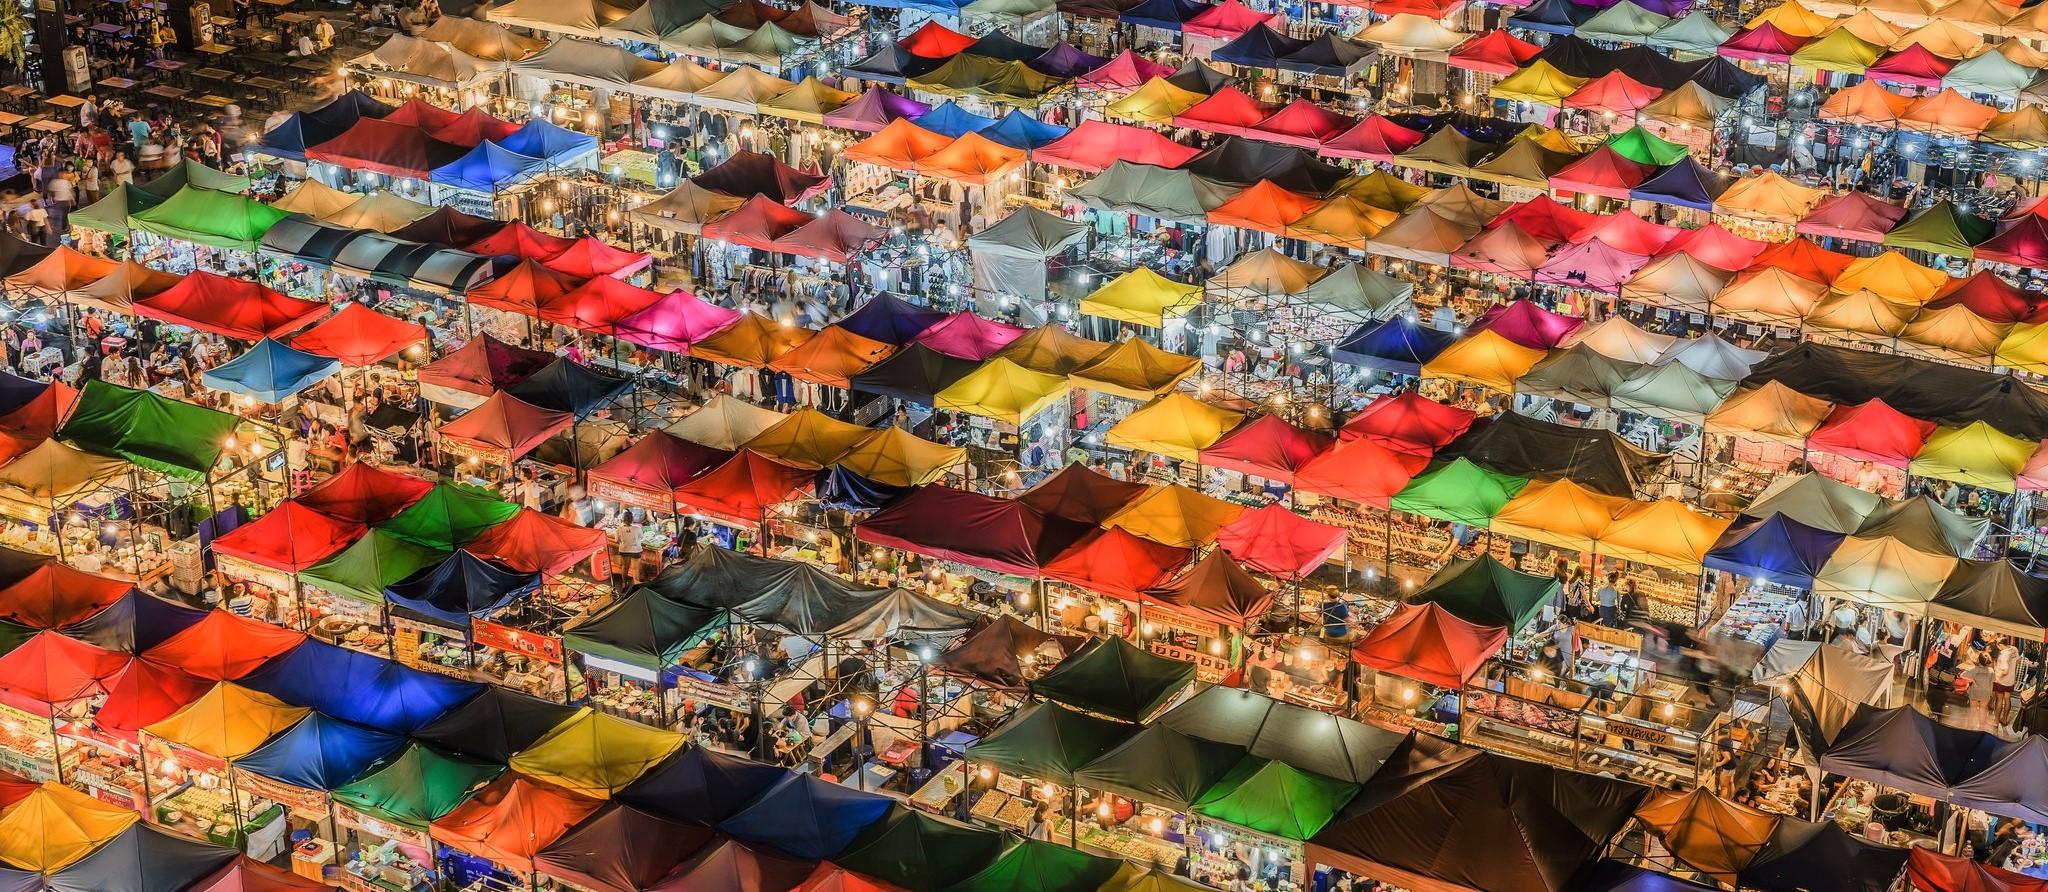 A night market in Bangkok, April 2017 (Photo: Getty Images/Aotaro)